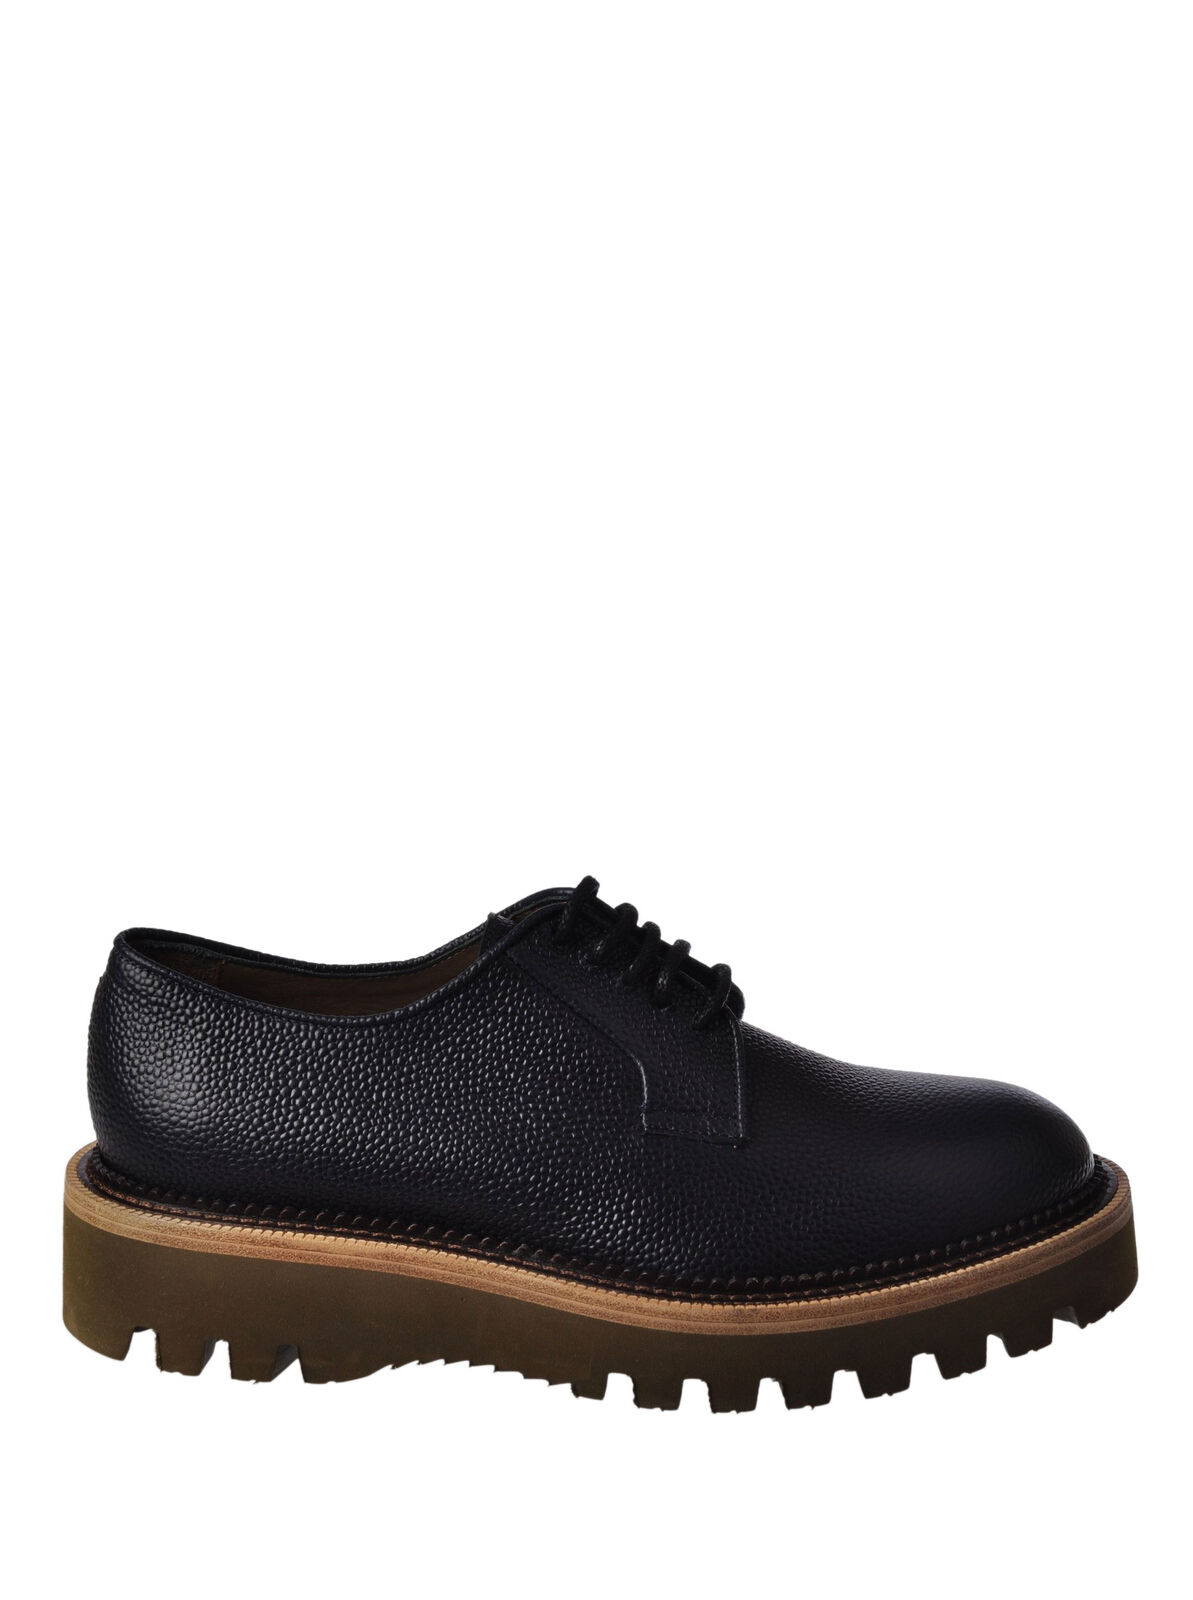 Scarpe casual da uomo  Hal - Shoes-Moccasins - Man - Blue - 894418C184700